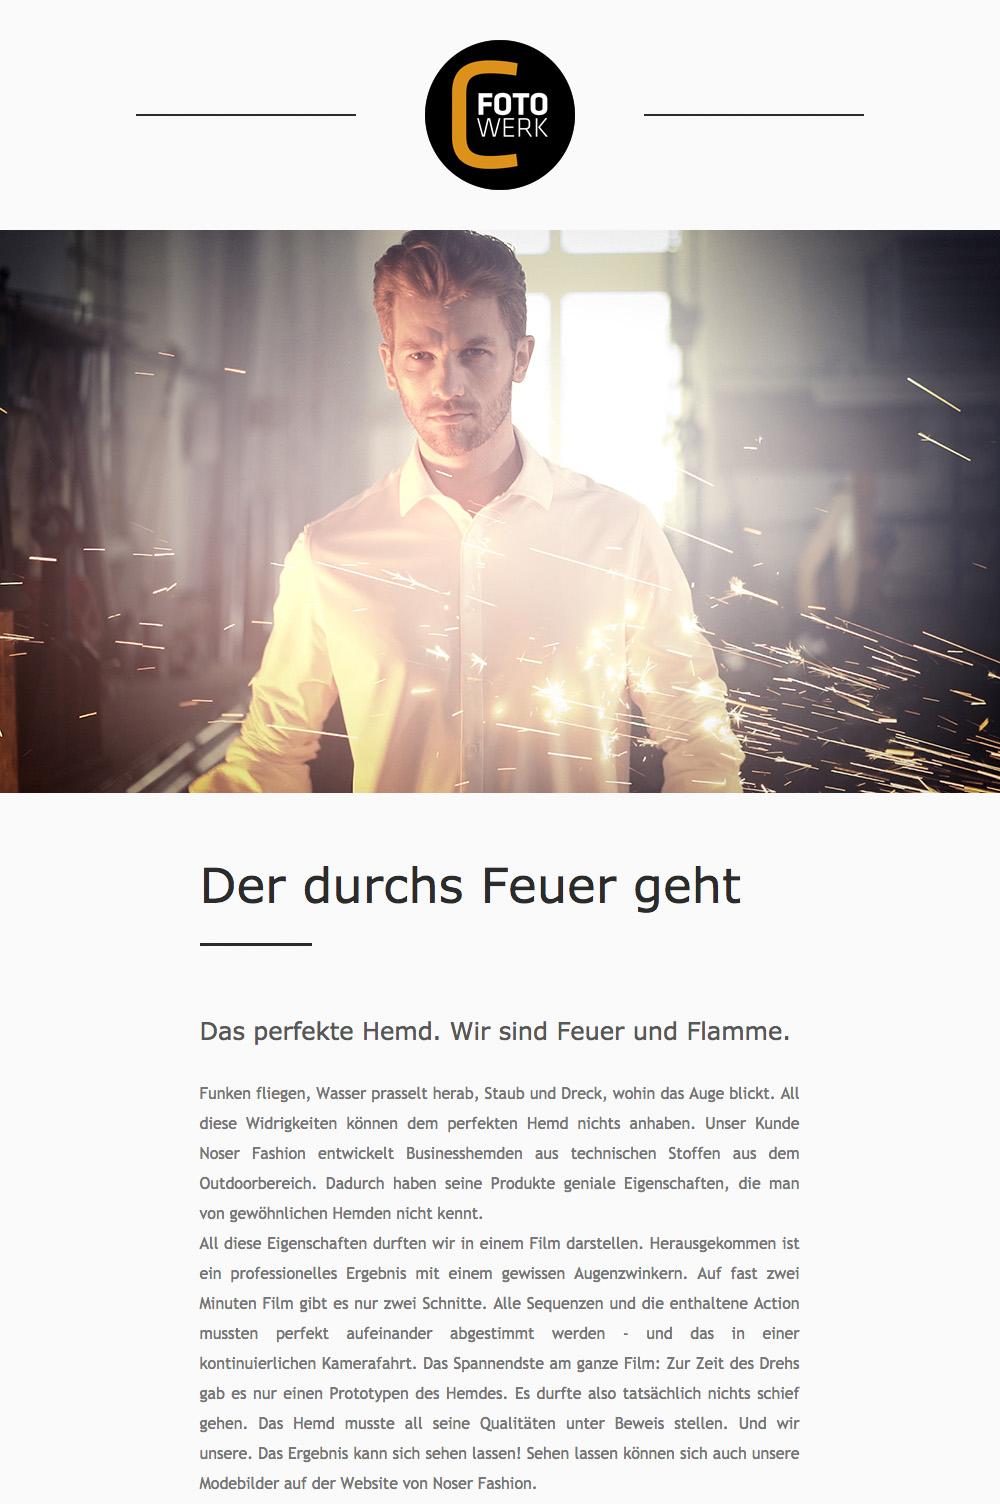 Fotowerk Newsletter 2018-03 - Imagefilm, Bildkampagne, Kunstfotografie